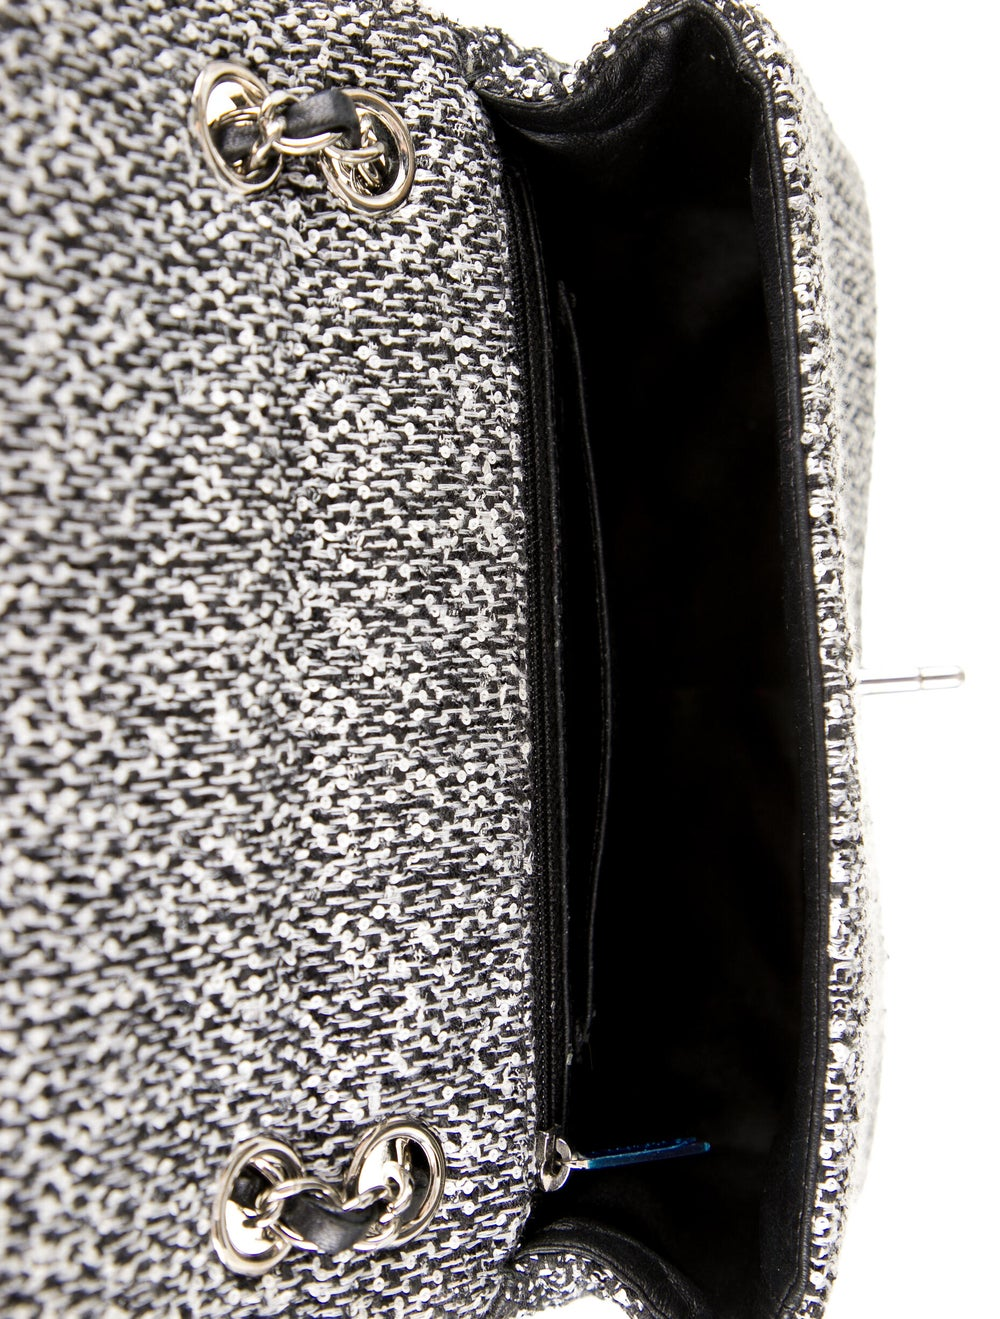 Chanel Tweed Elementary Chic Flap Bag Black - image 5